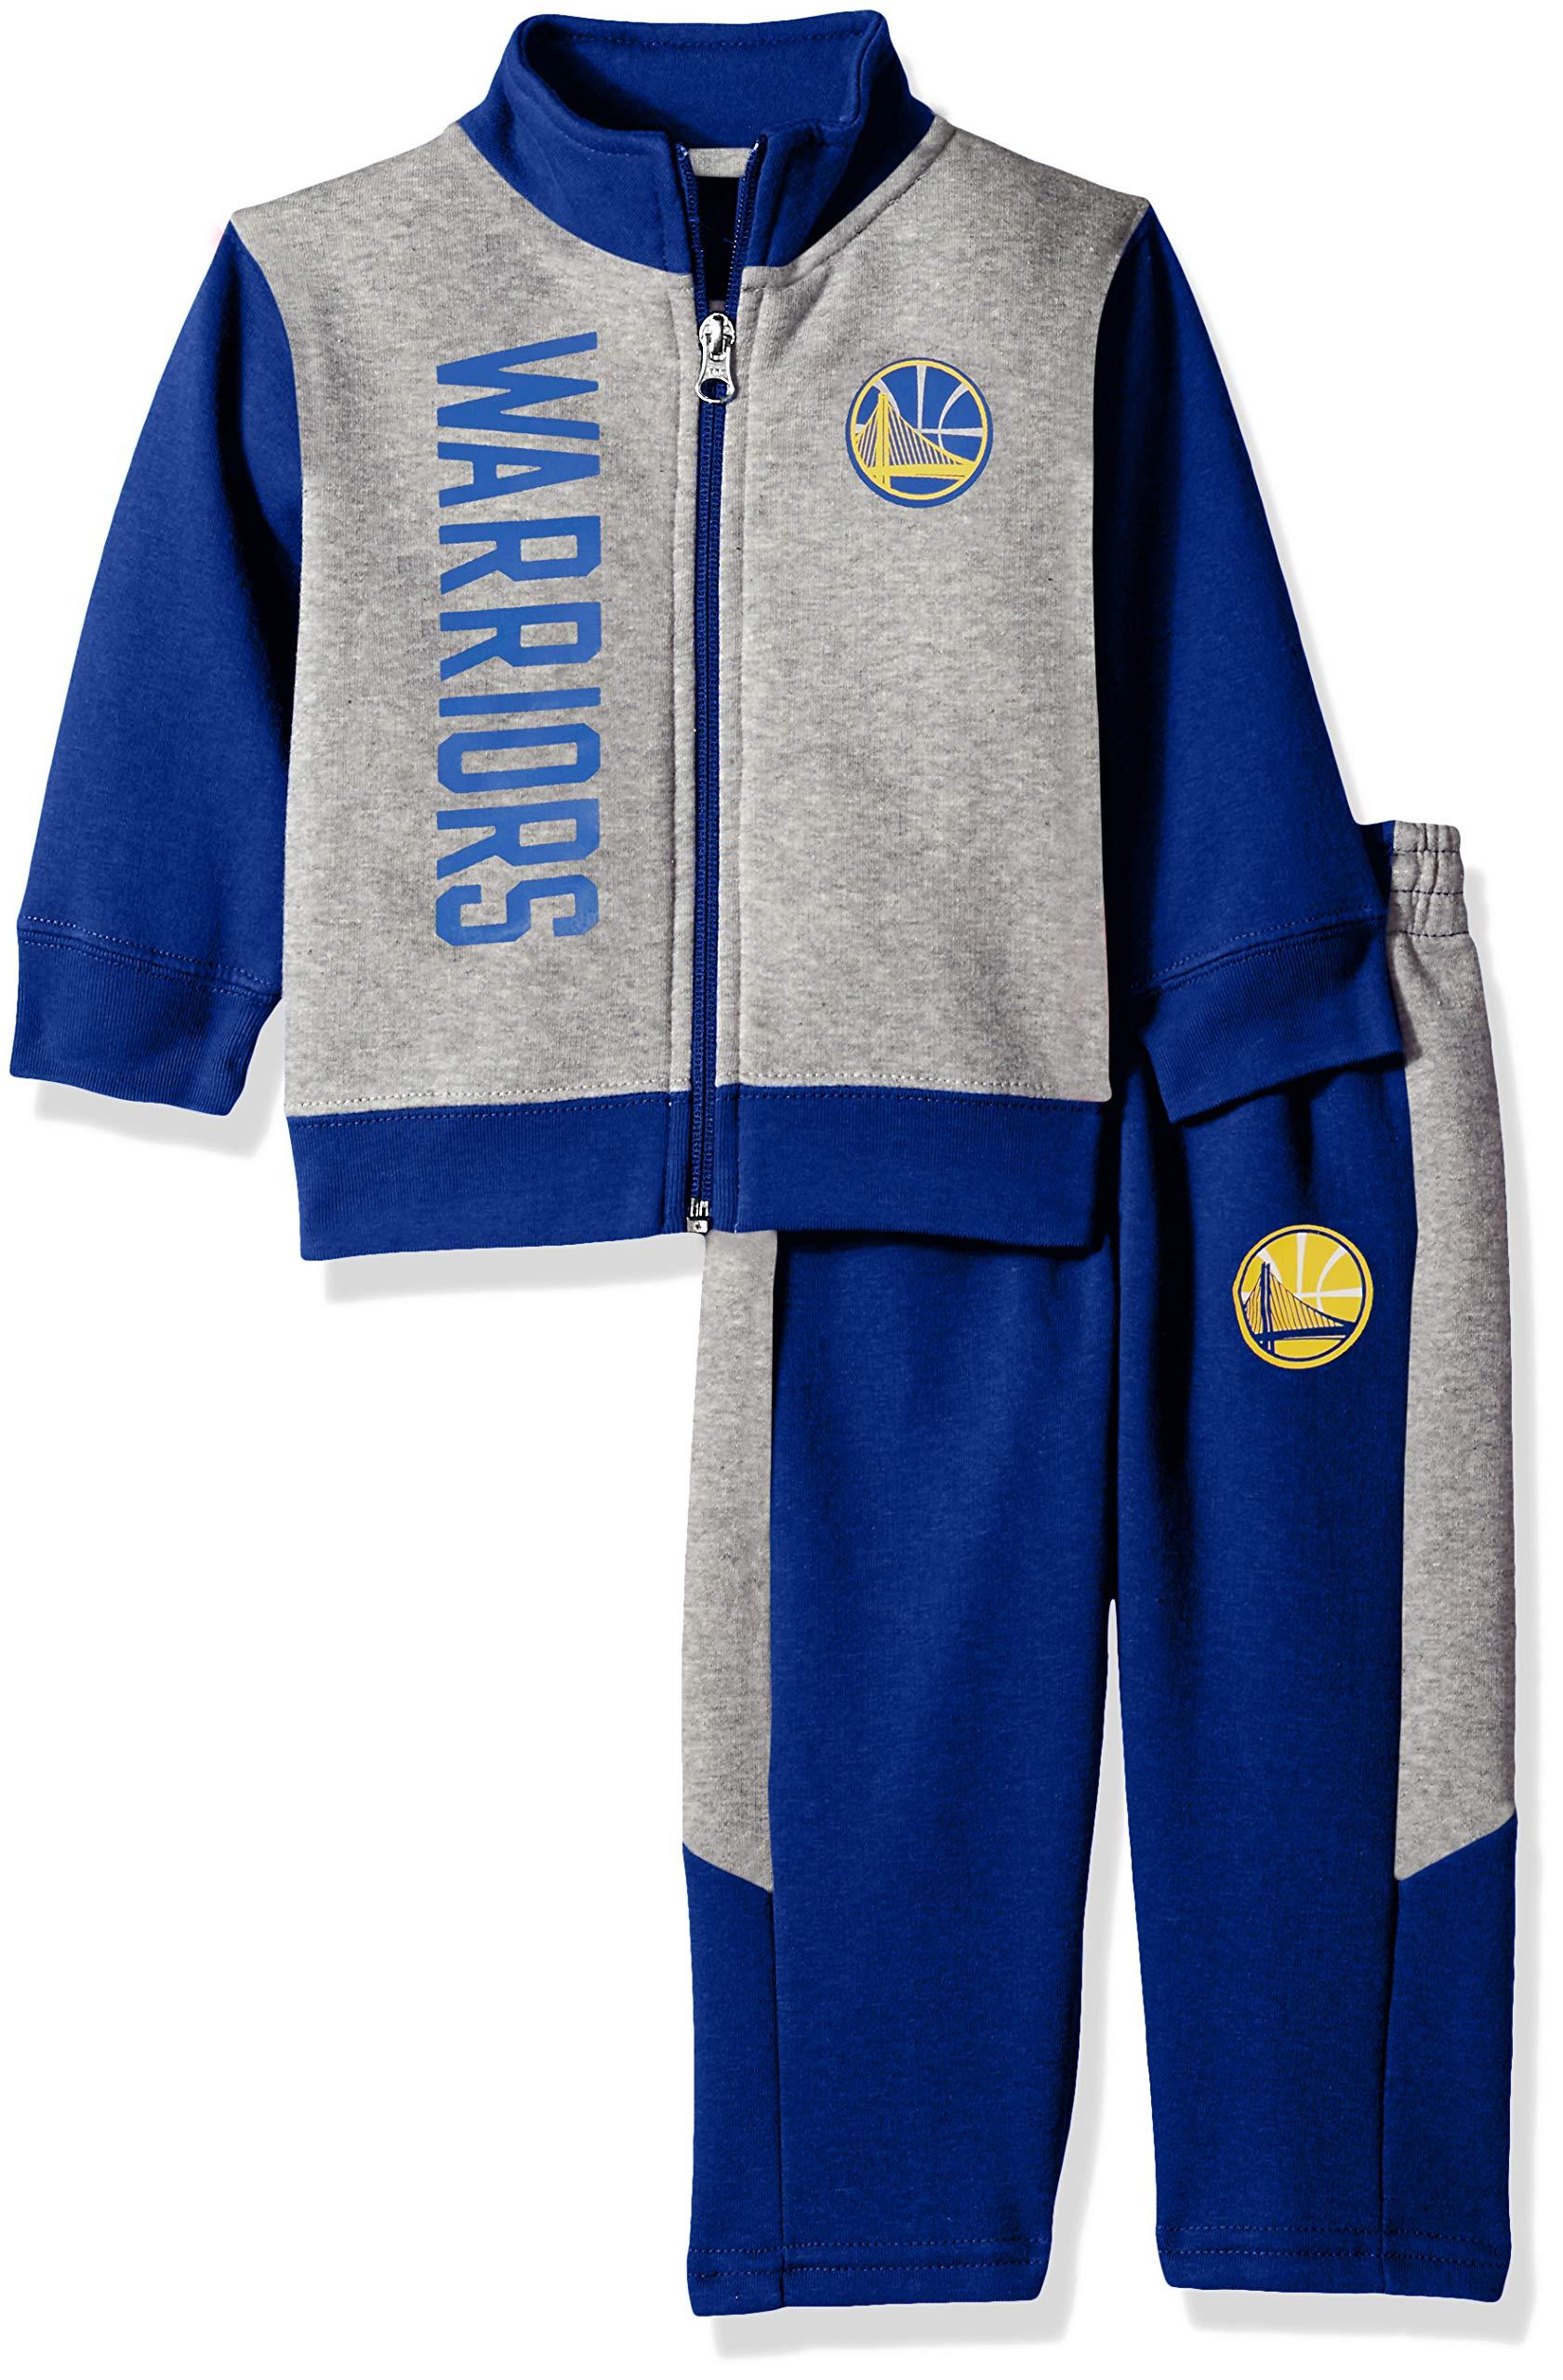 Outerstuff NBA NBA Infant Golden State Warriors On The Line Jacket & Pants Fleece Set, Blue, 18 Months by Outerstuff